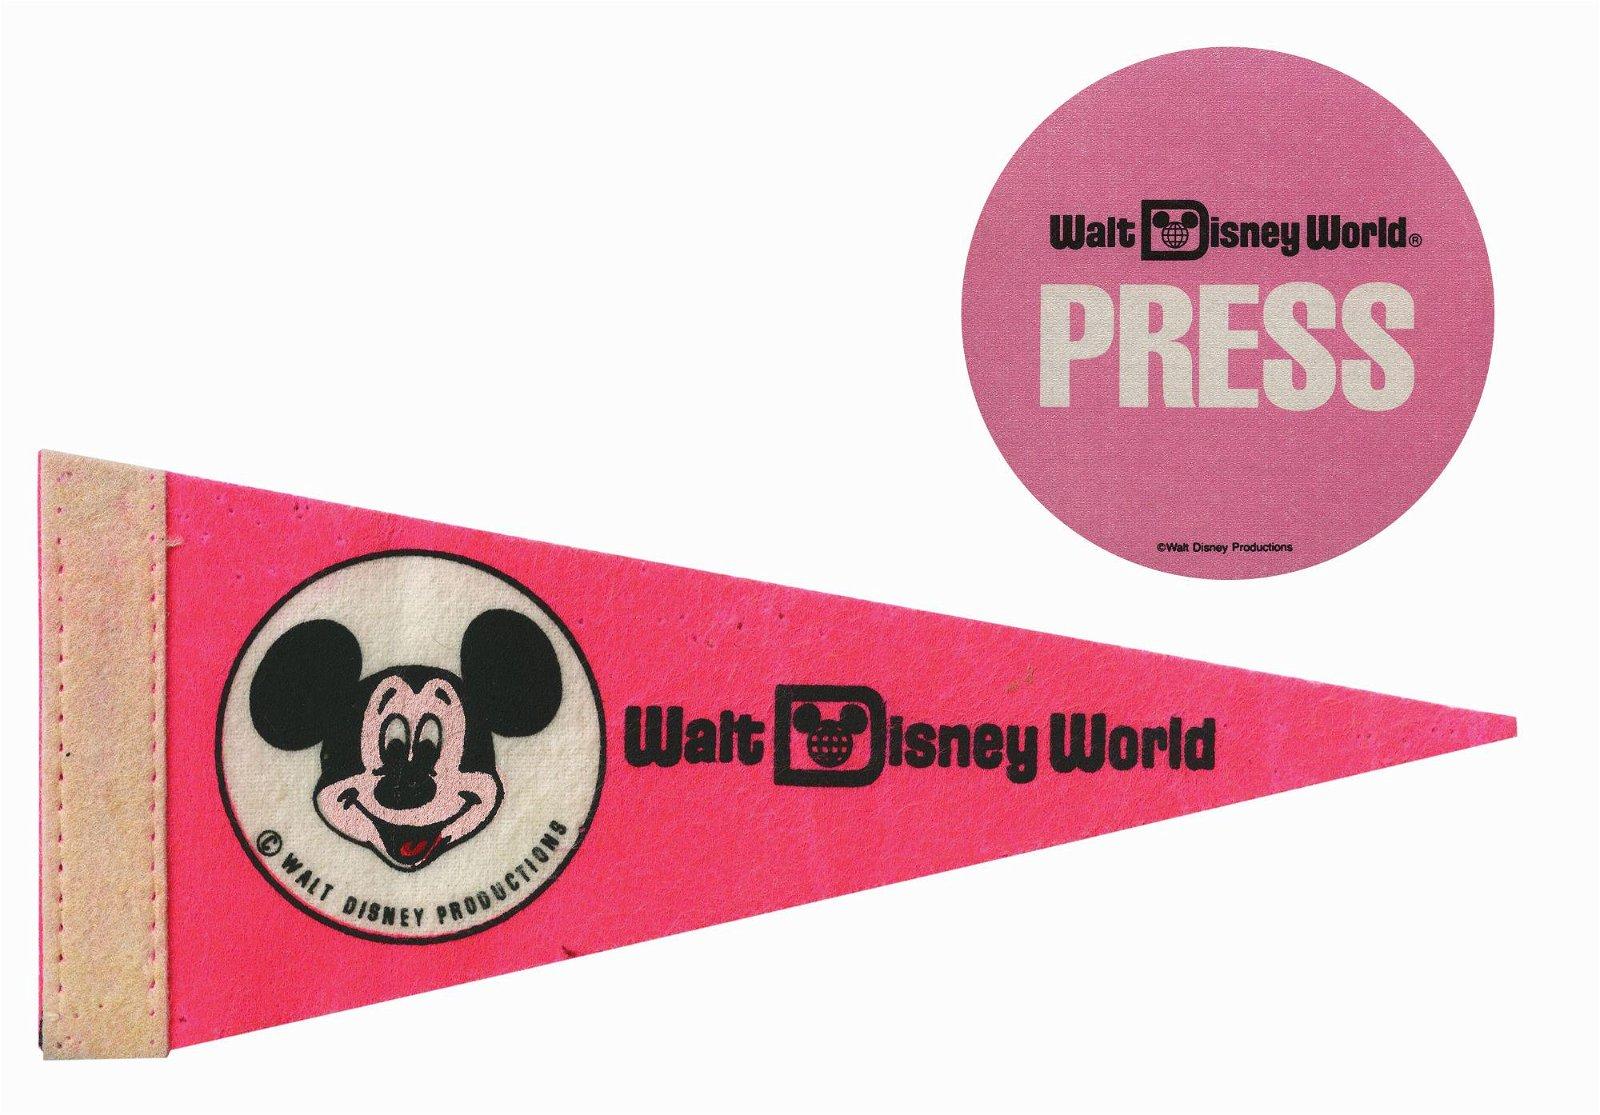 Walt Disney World Opening Pennant & Press Pass.